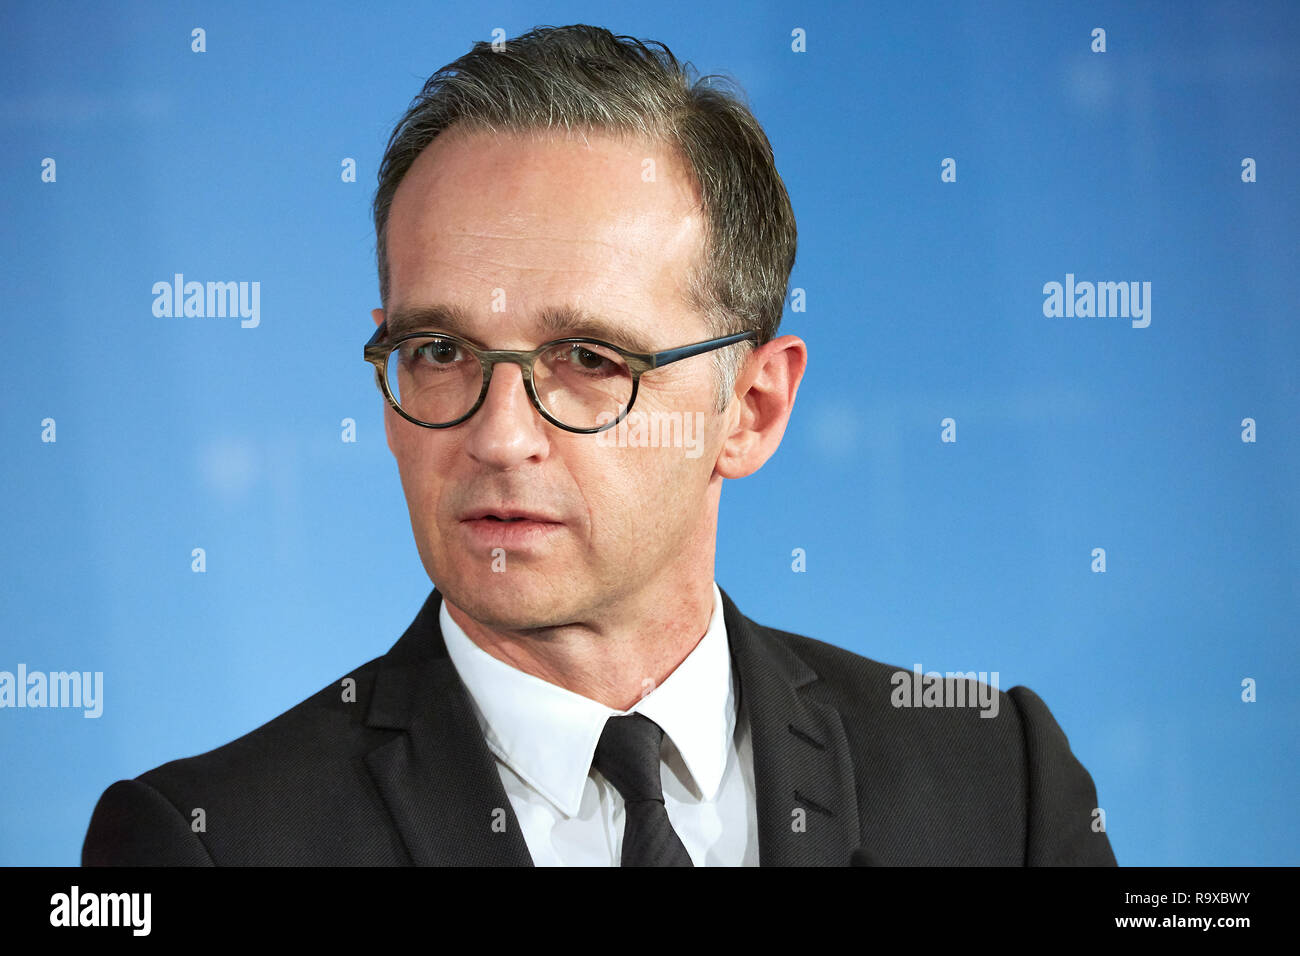 17.10.2018, Berlin, Deutschland - Bundesaussenminister Heiko Maas. 00R181017D020 [MODEL RELEASE: NO, PROPERTY RELEASE: NO (c) caro images / Thomas Ruf - Stock Image